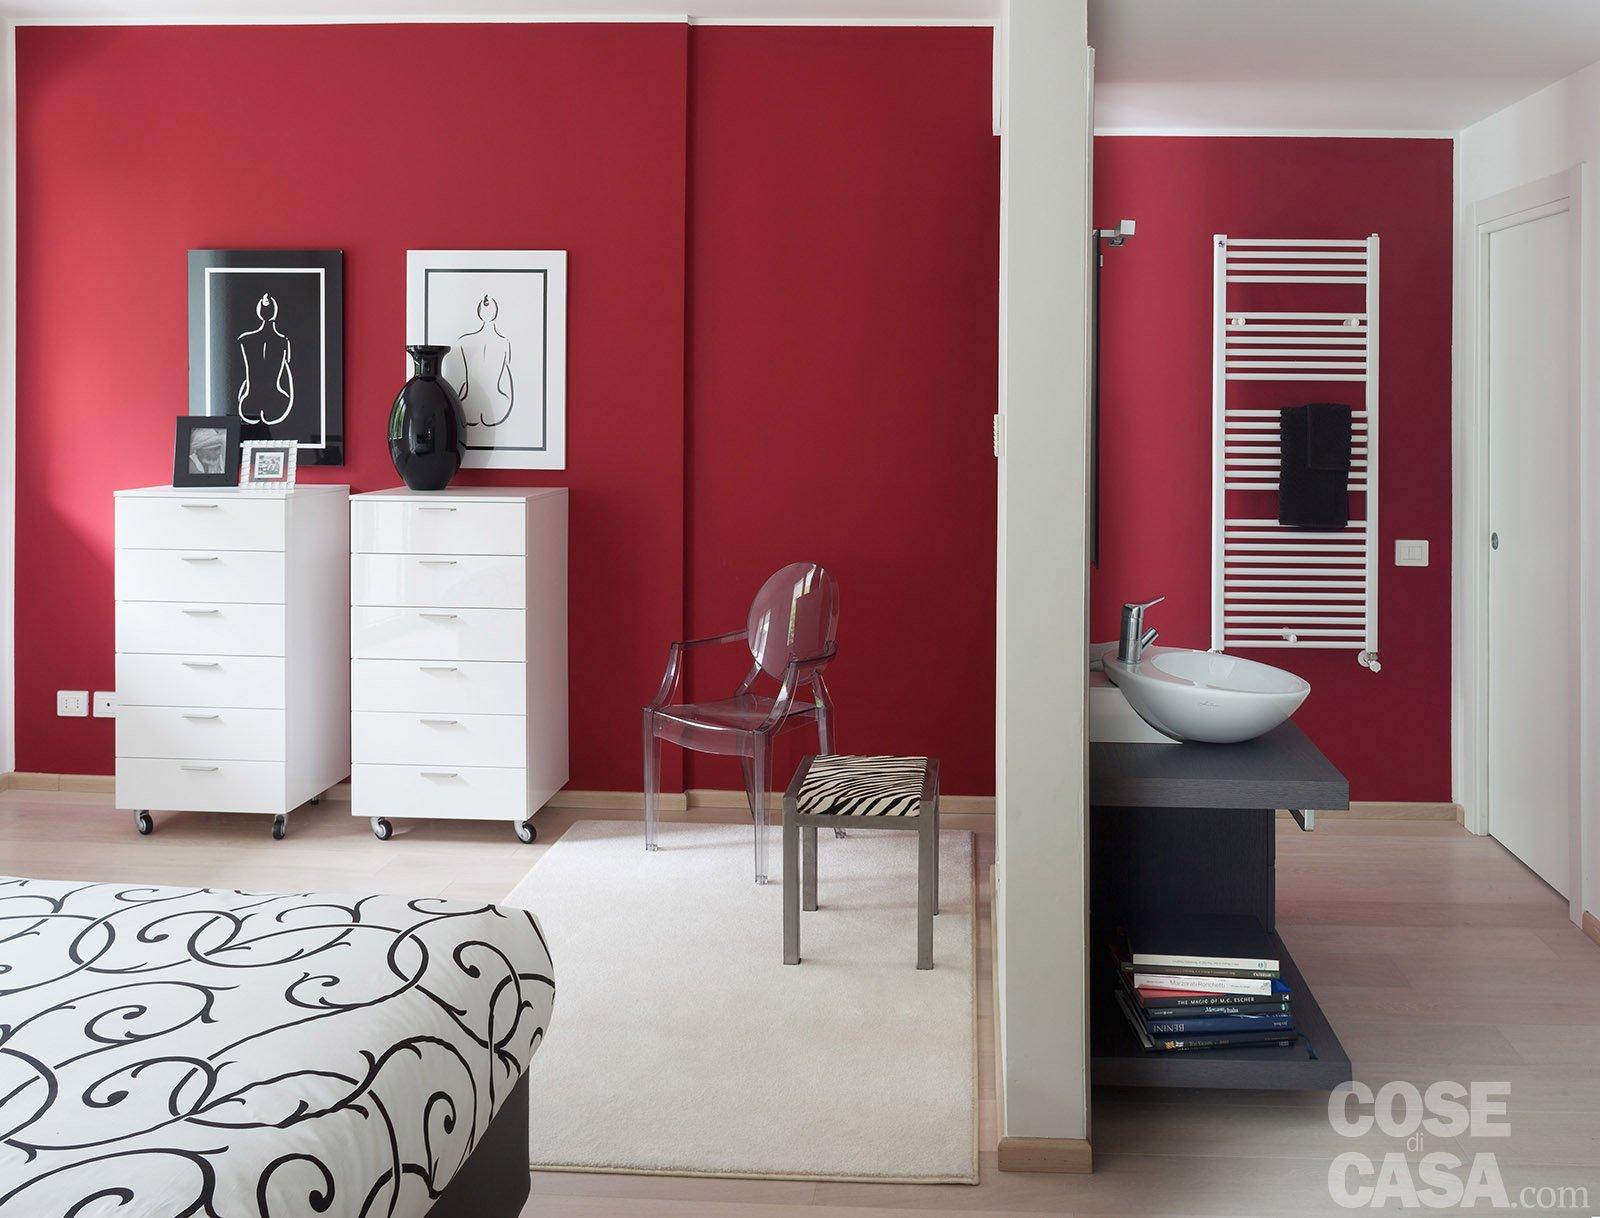 In meno di 100 mq una casa moderna con geometrie a 3 colori cose di casa - Colori interni casa moderna ...